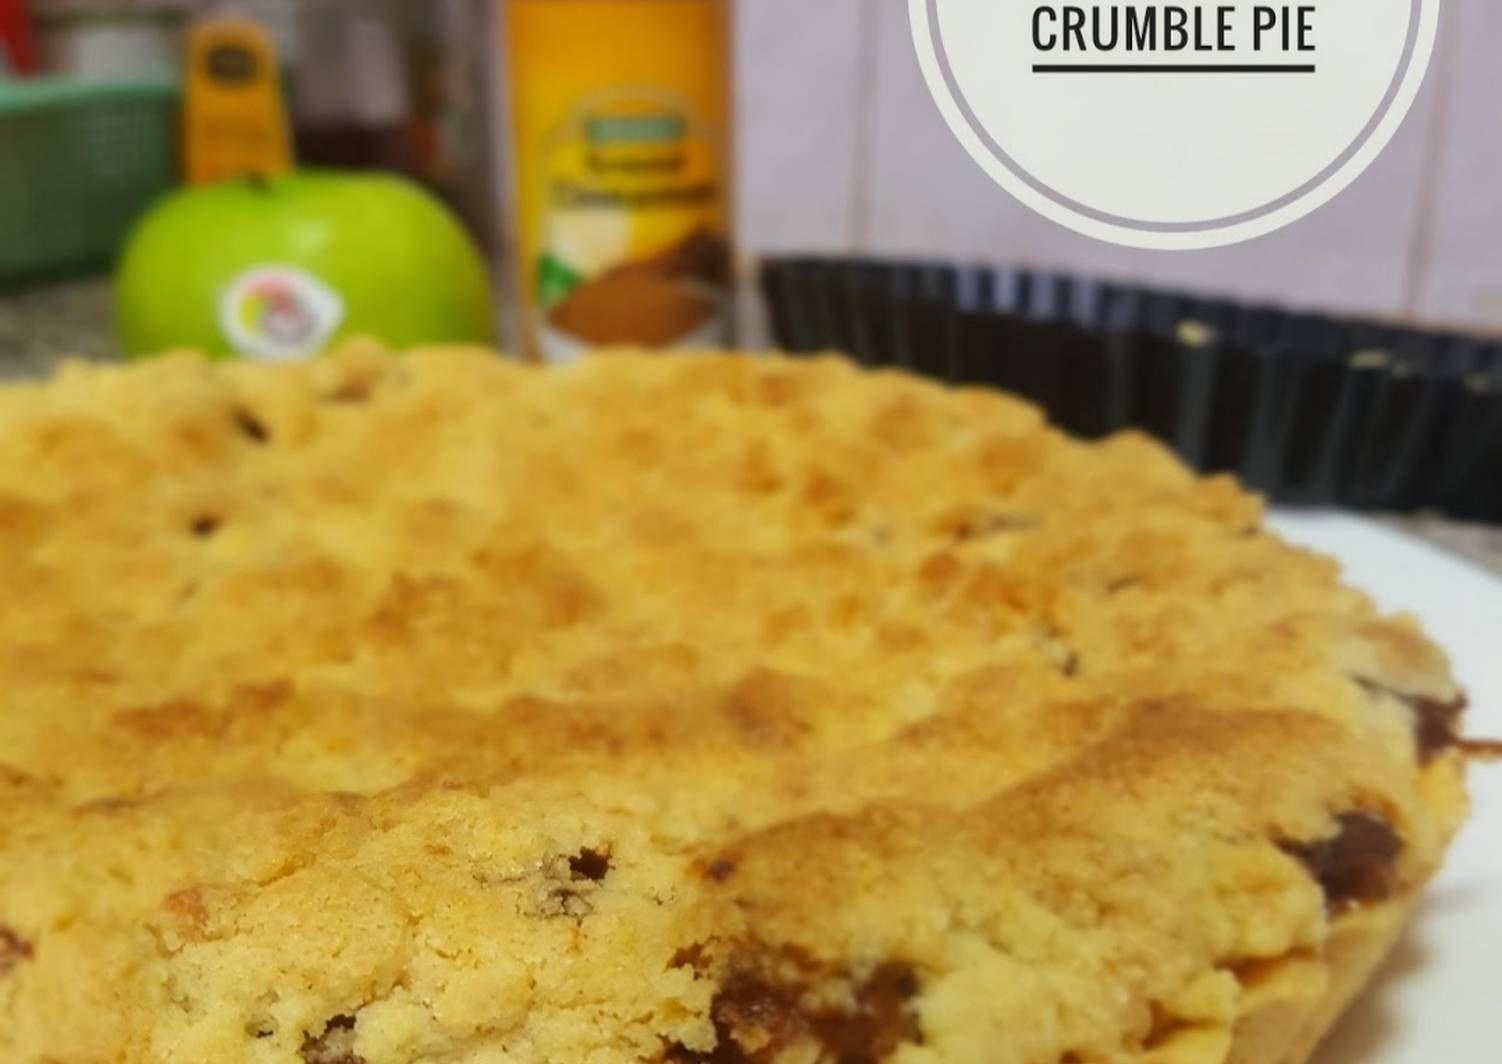 Resep Apple Crumble Pie Oleh Marina Laksmitawati Resep Penggiling Adonan Kayu Manis Pastry